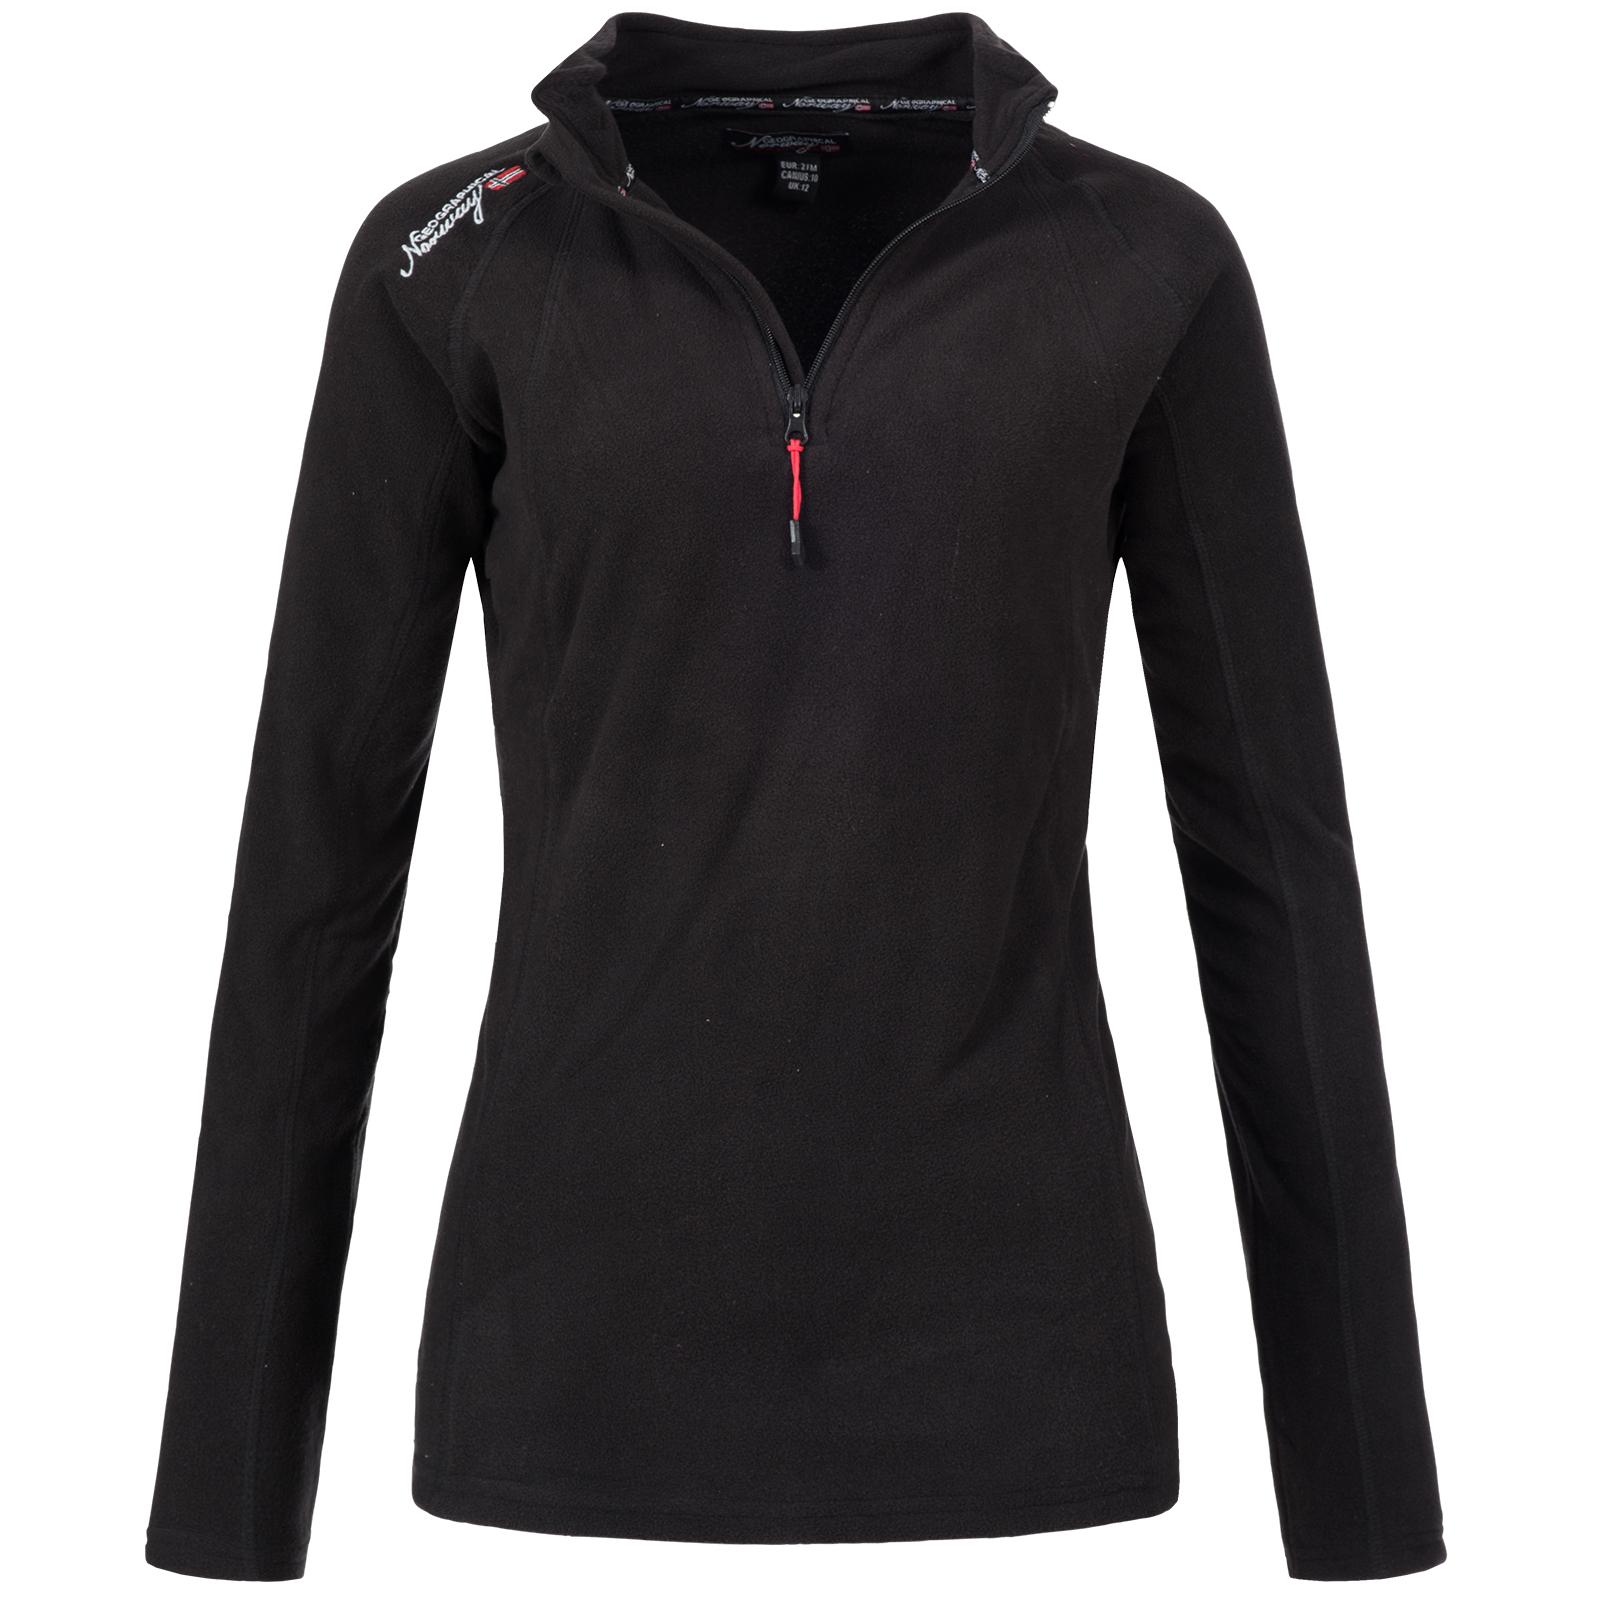 Geographical Norway Damen Fleece Pullover Sweatshirt  CL 02030 Gr. S M L XL XXL